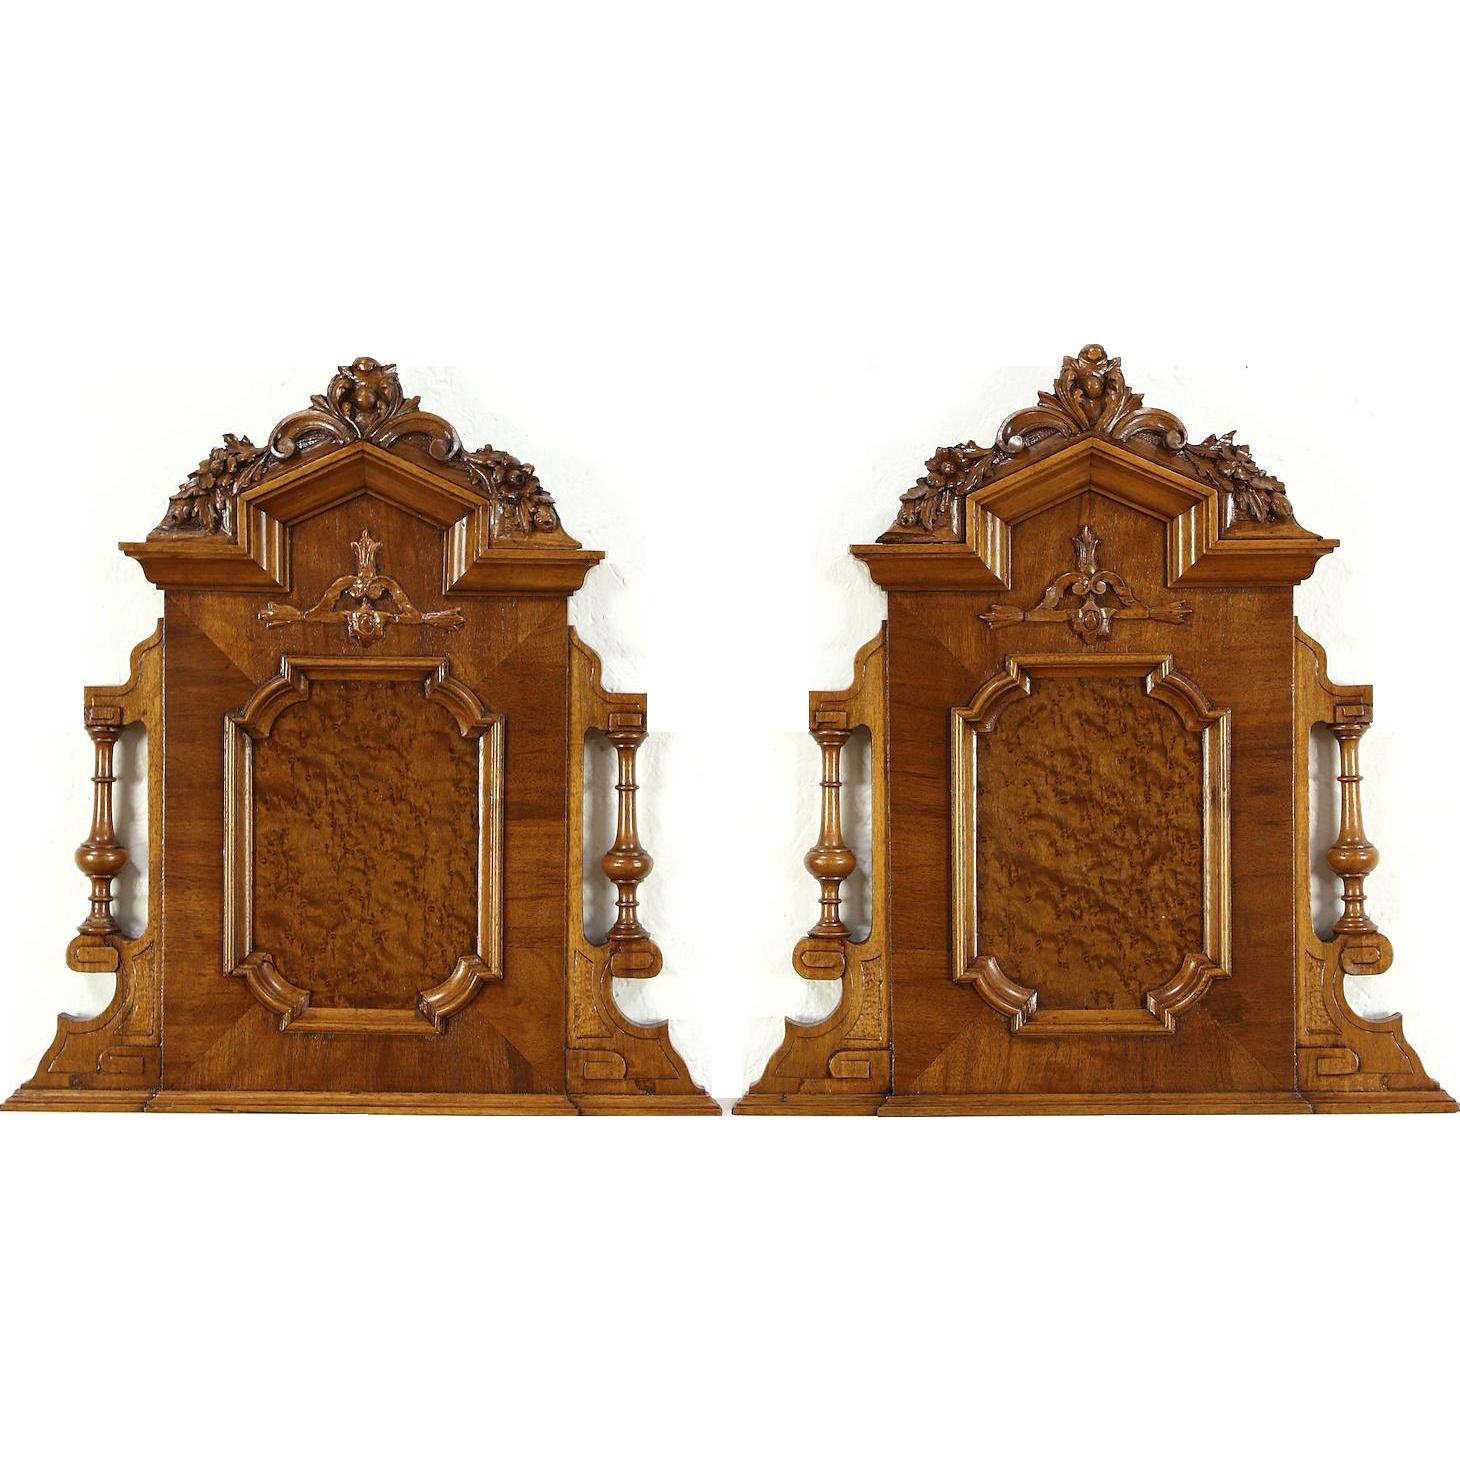 Pair of Italian 1900 Antique Salvage Architectural Fragment